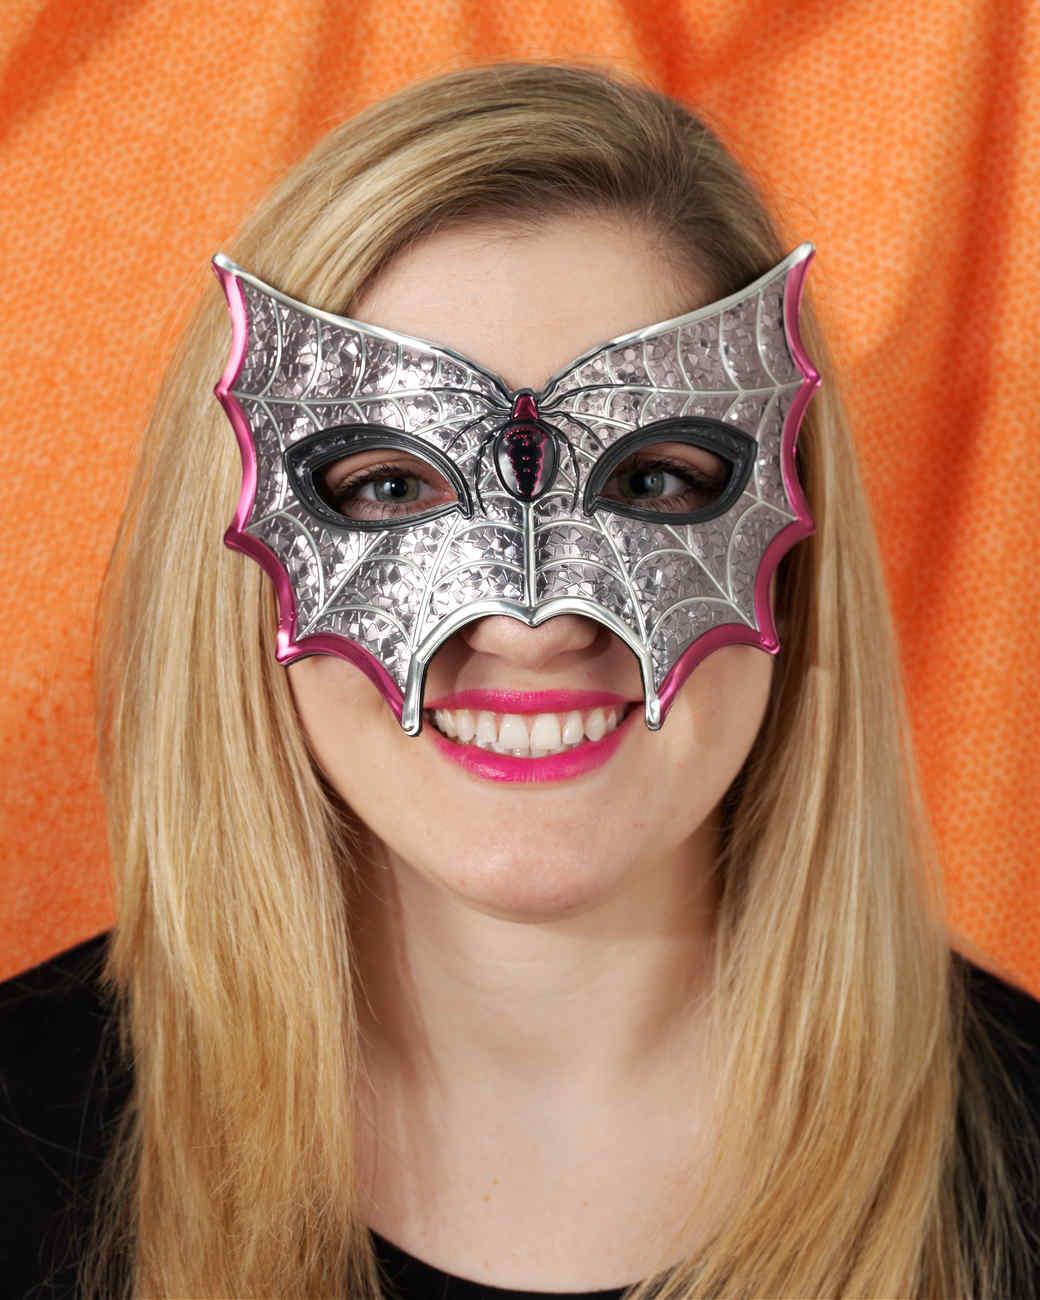 mscrafts-hlwn-mask4.jpg